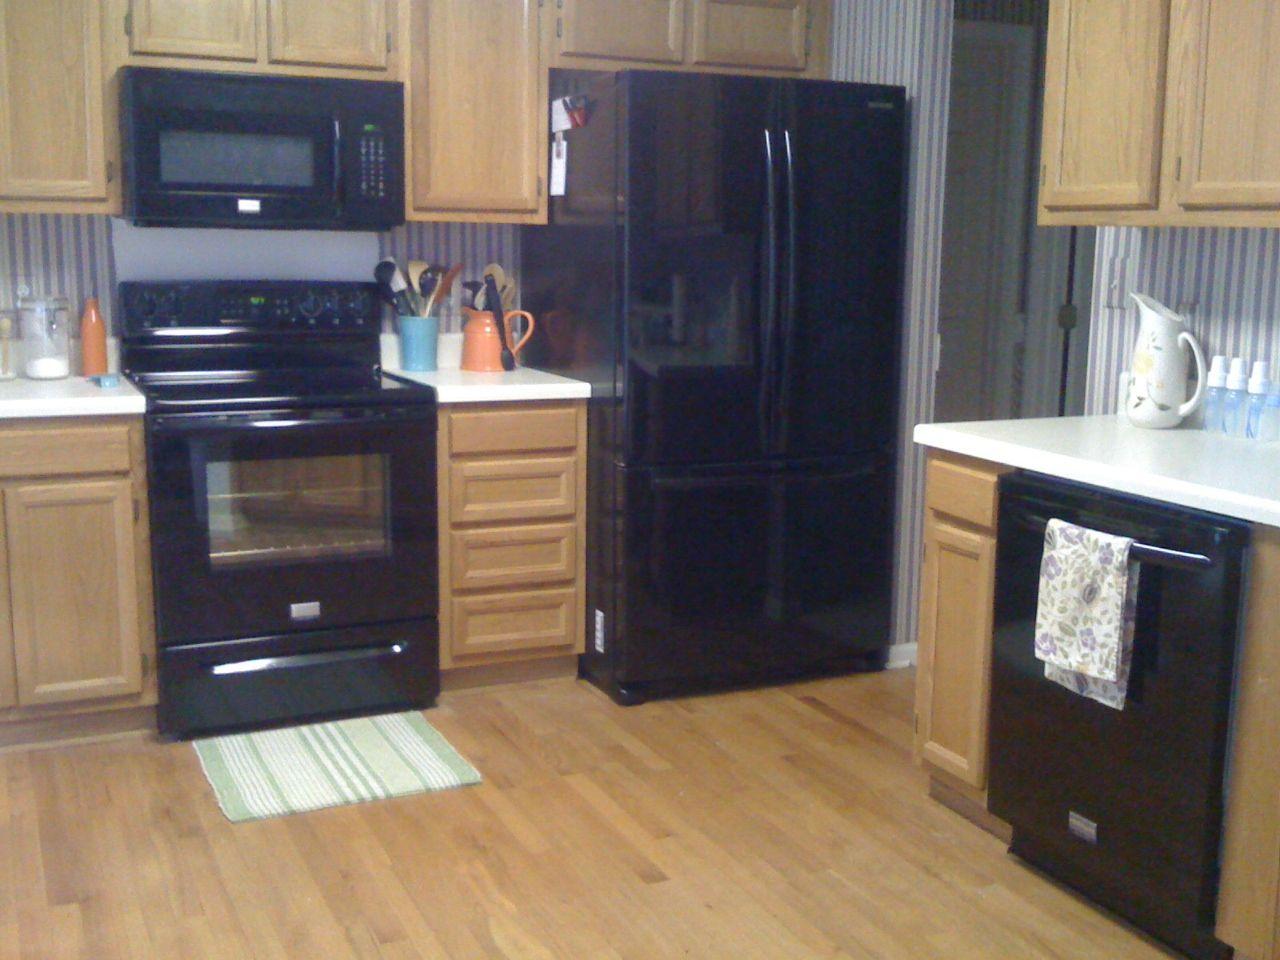 kitchens with black appliances photos bing images black appliances kitchen kitchen on kitchen remodel appliances id=53689